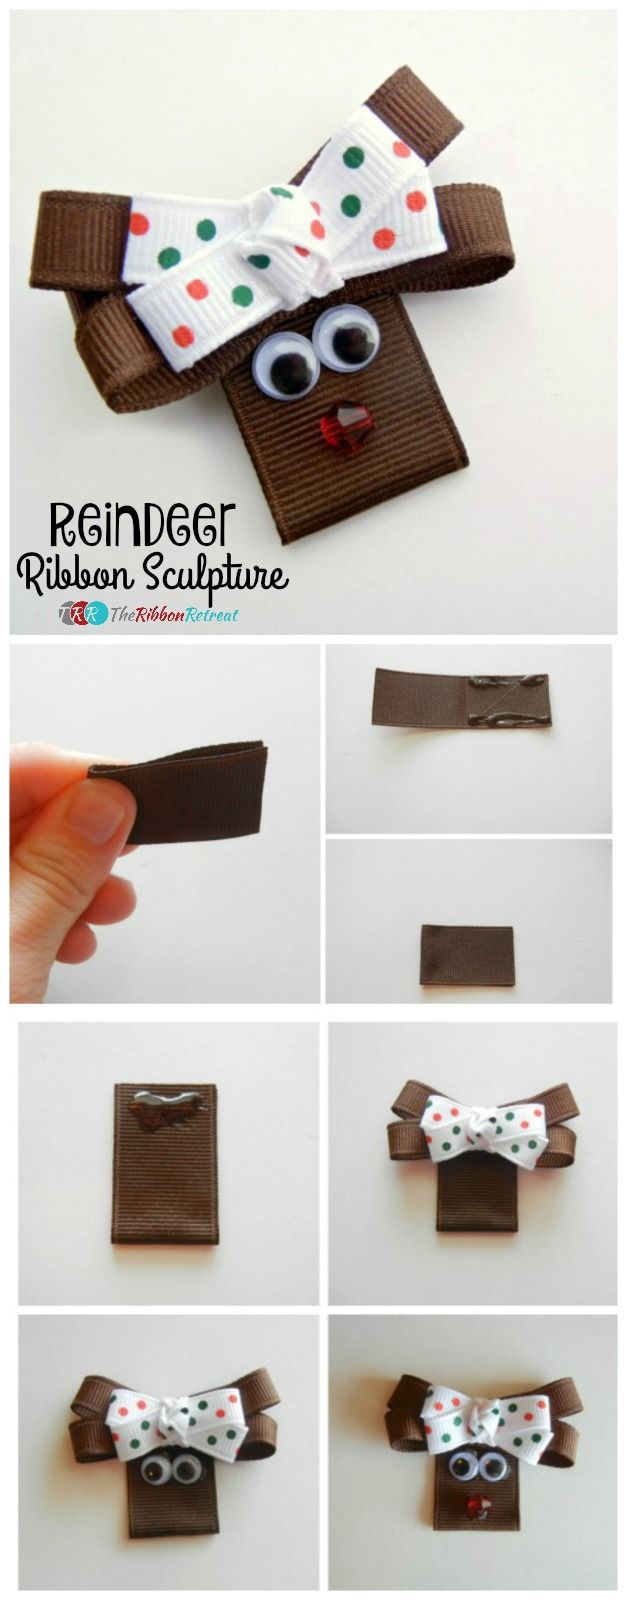 Reindeer Ribbon Sculpture - The Ribbon Retreat Blog